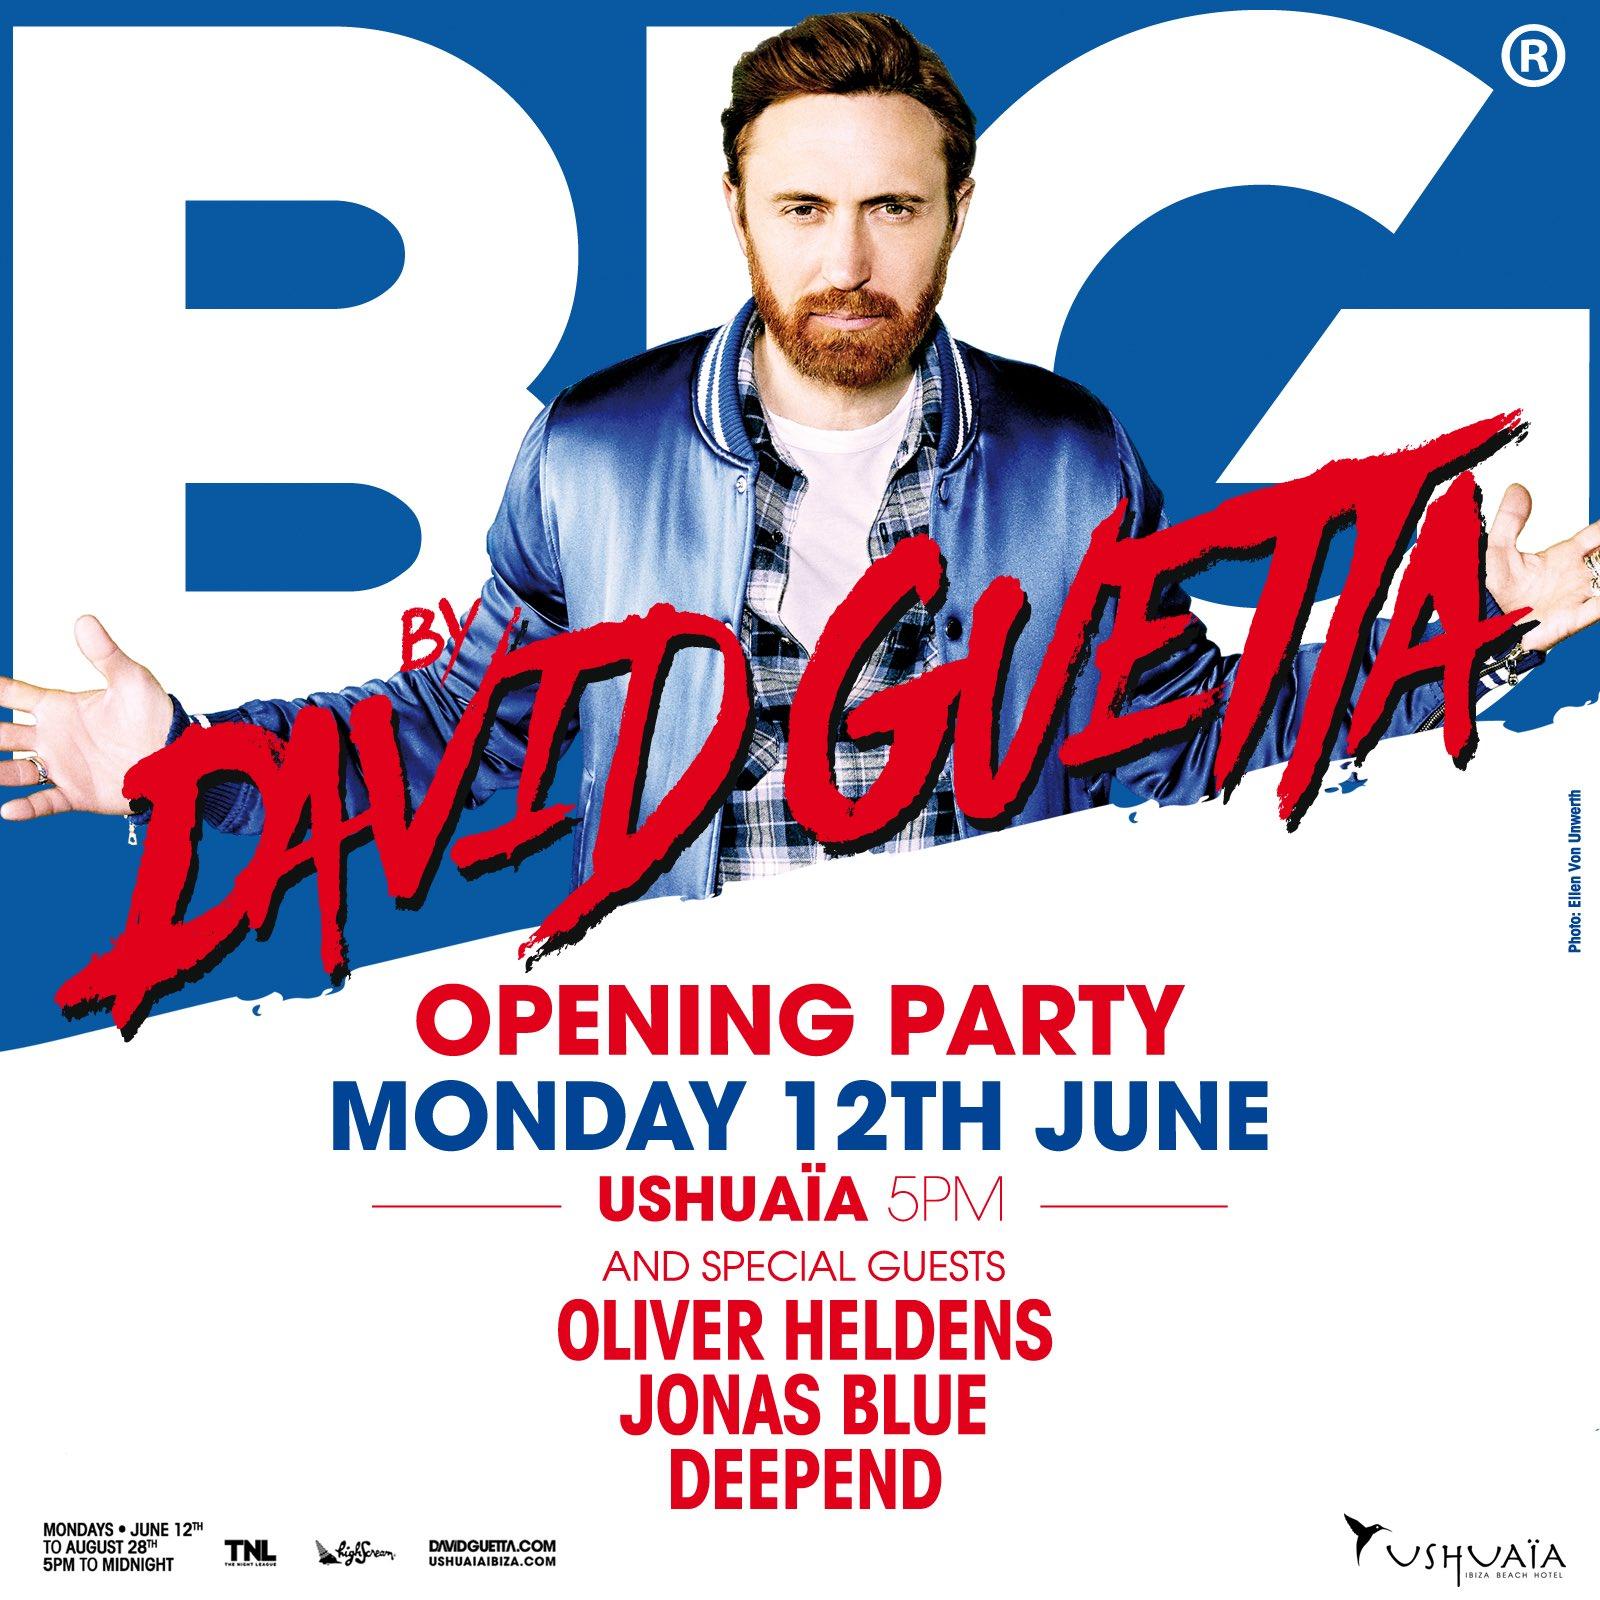 Hey guys @OliverHeldens @JonasBlue @deependmusic, ready for tomorrow ? #ushuaiaibiza #BIGtheparty #OpeningParty https://t.co/qM3VNGkcKN